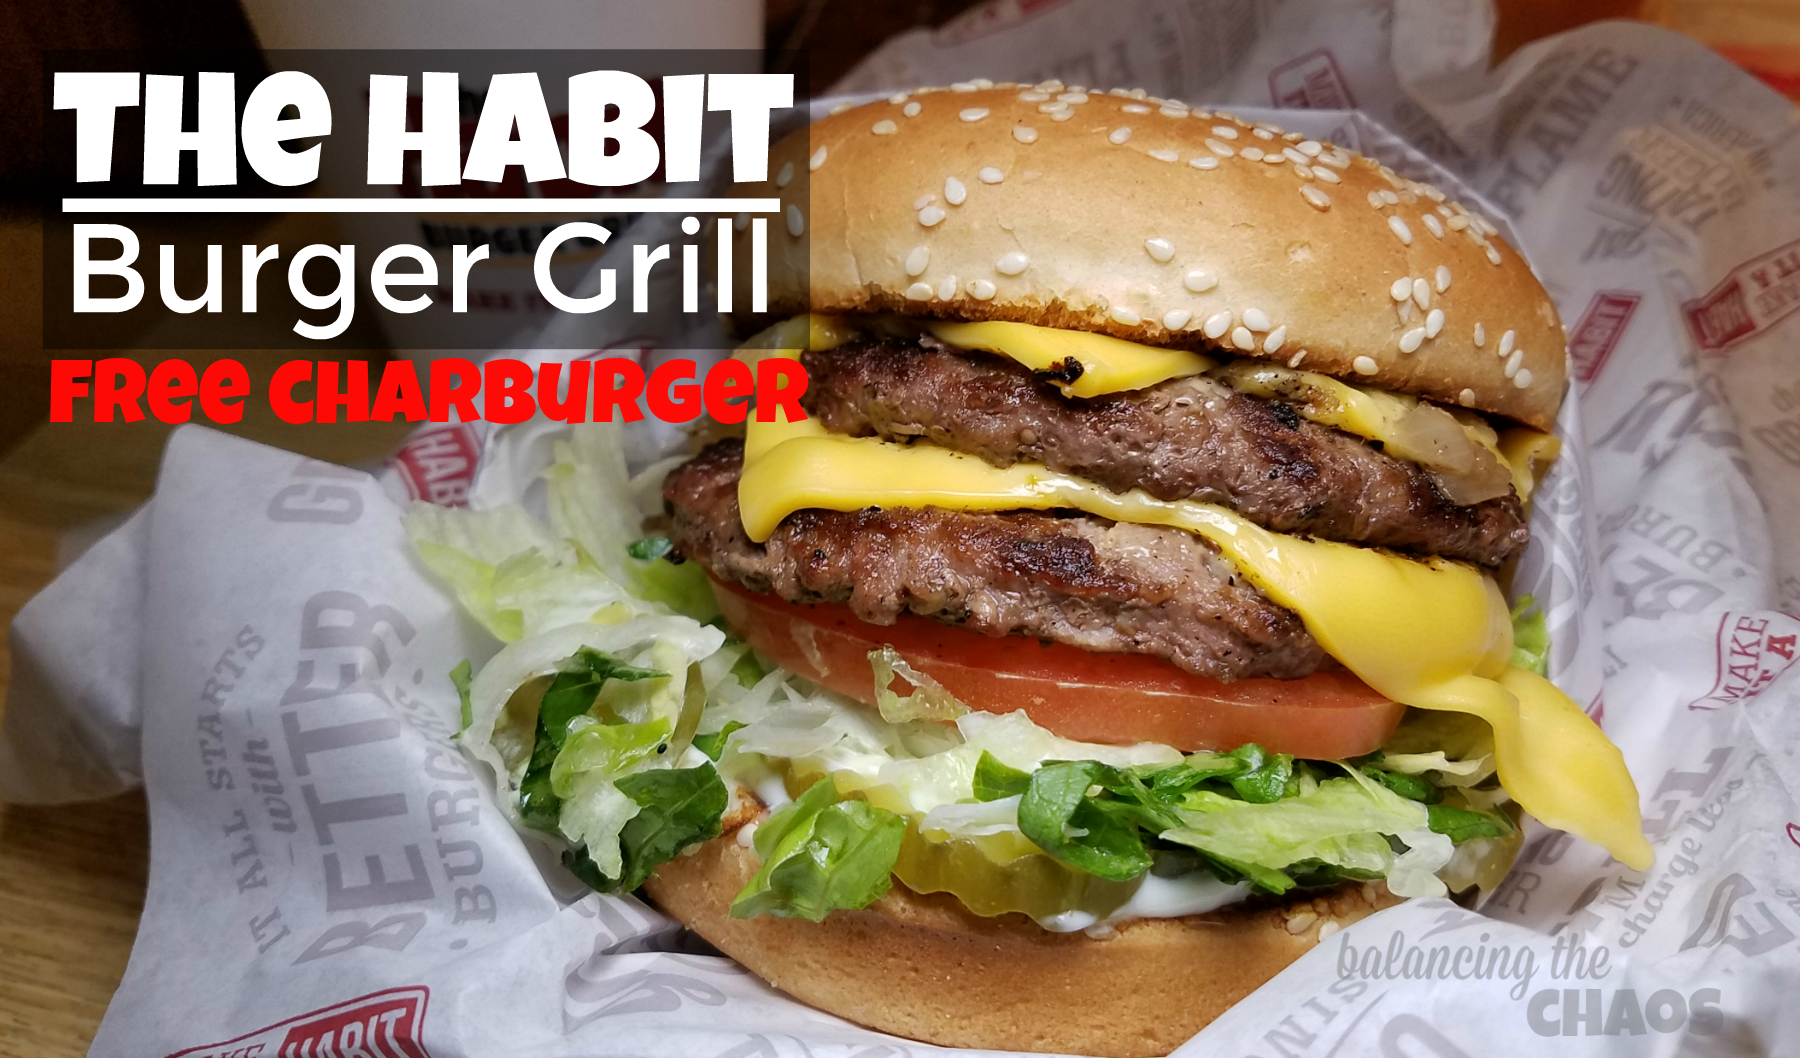 The Habit Burger Grill Free Charburger